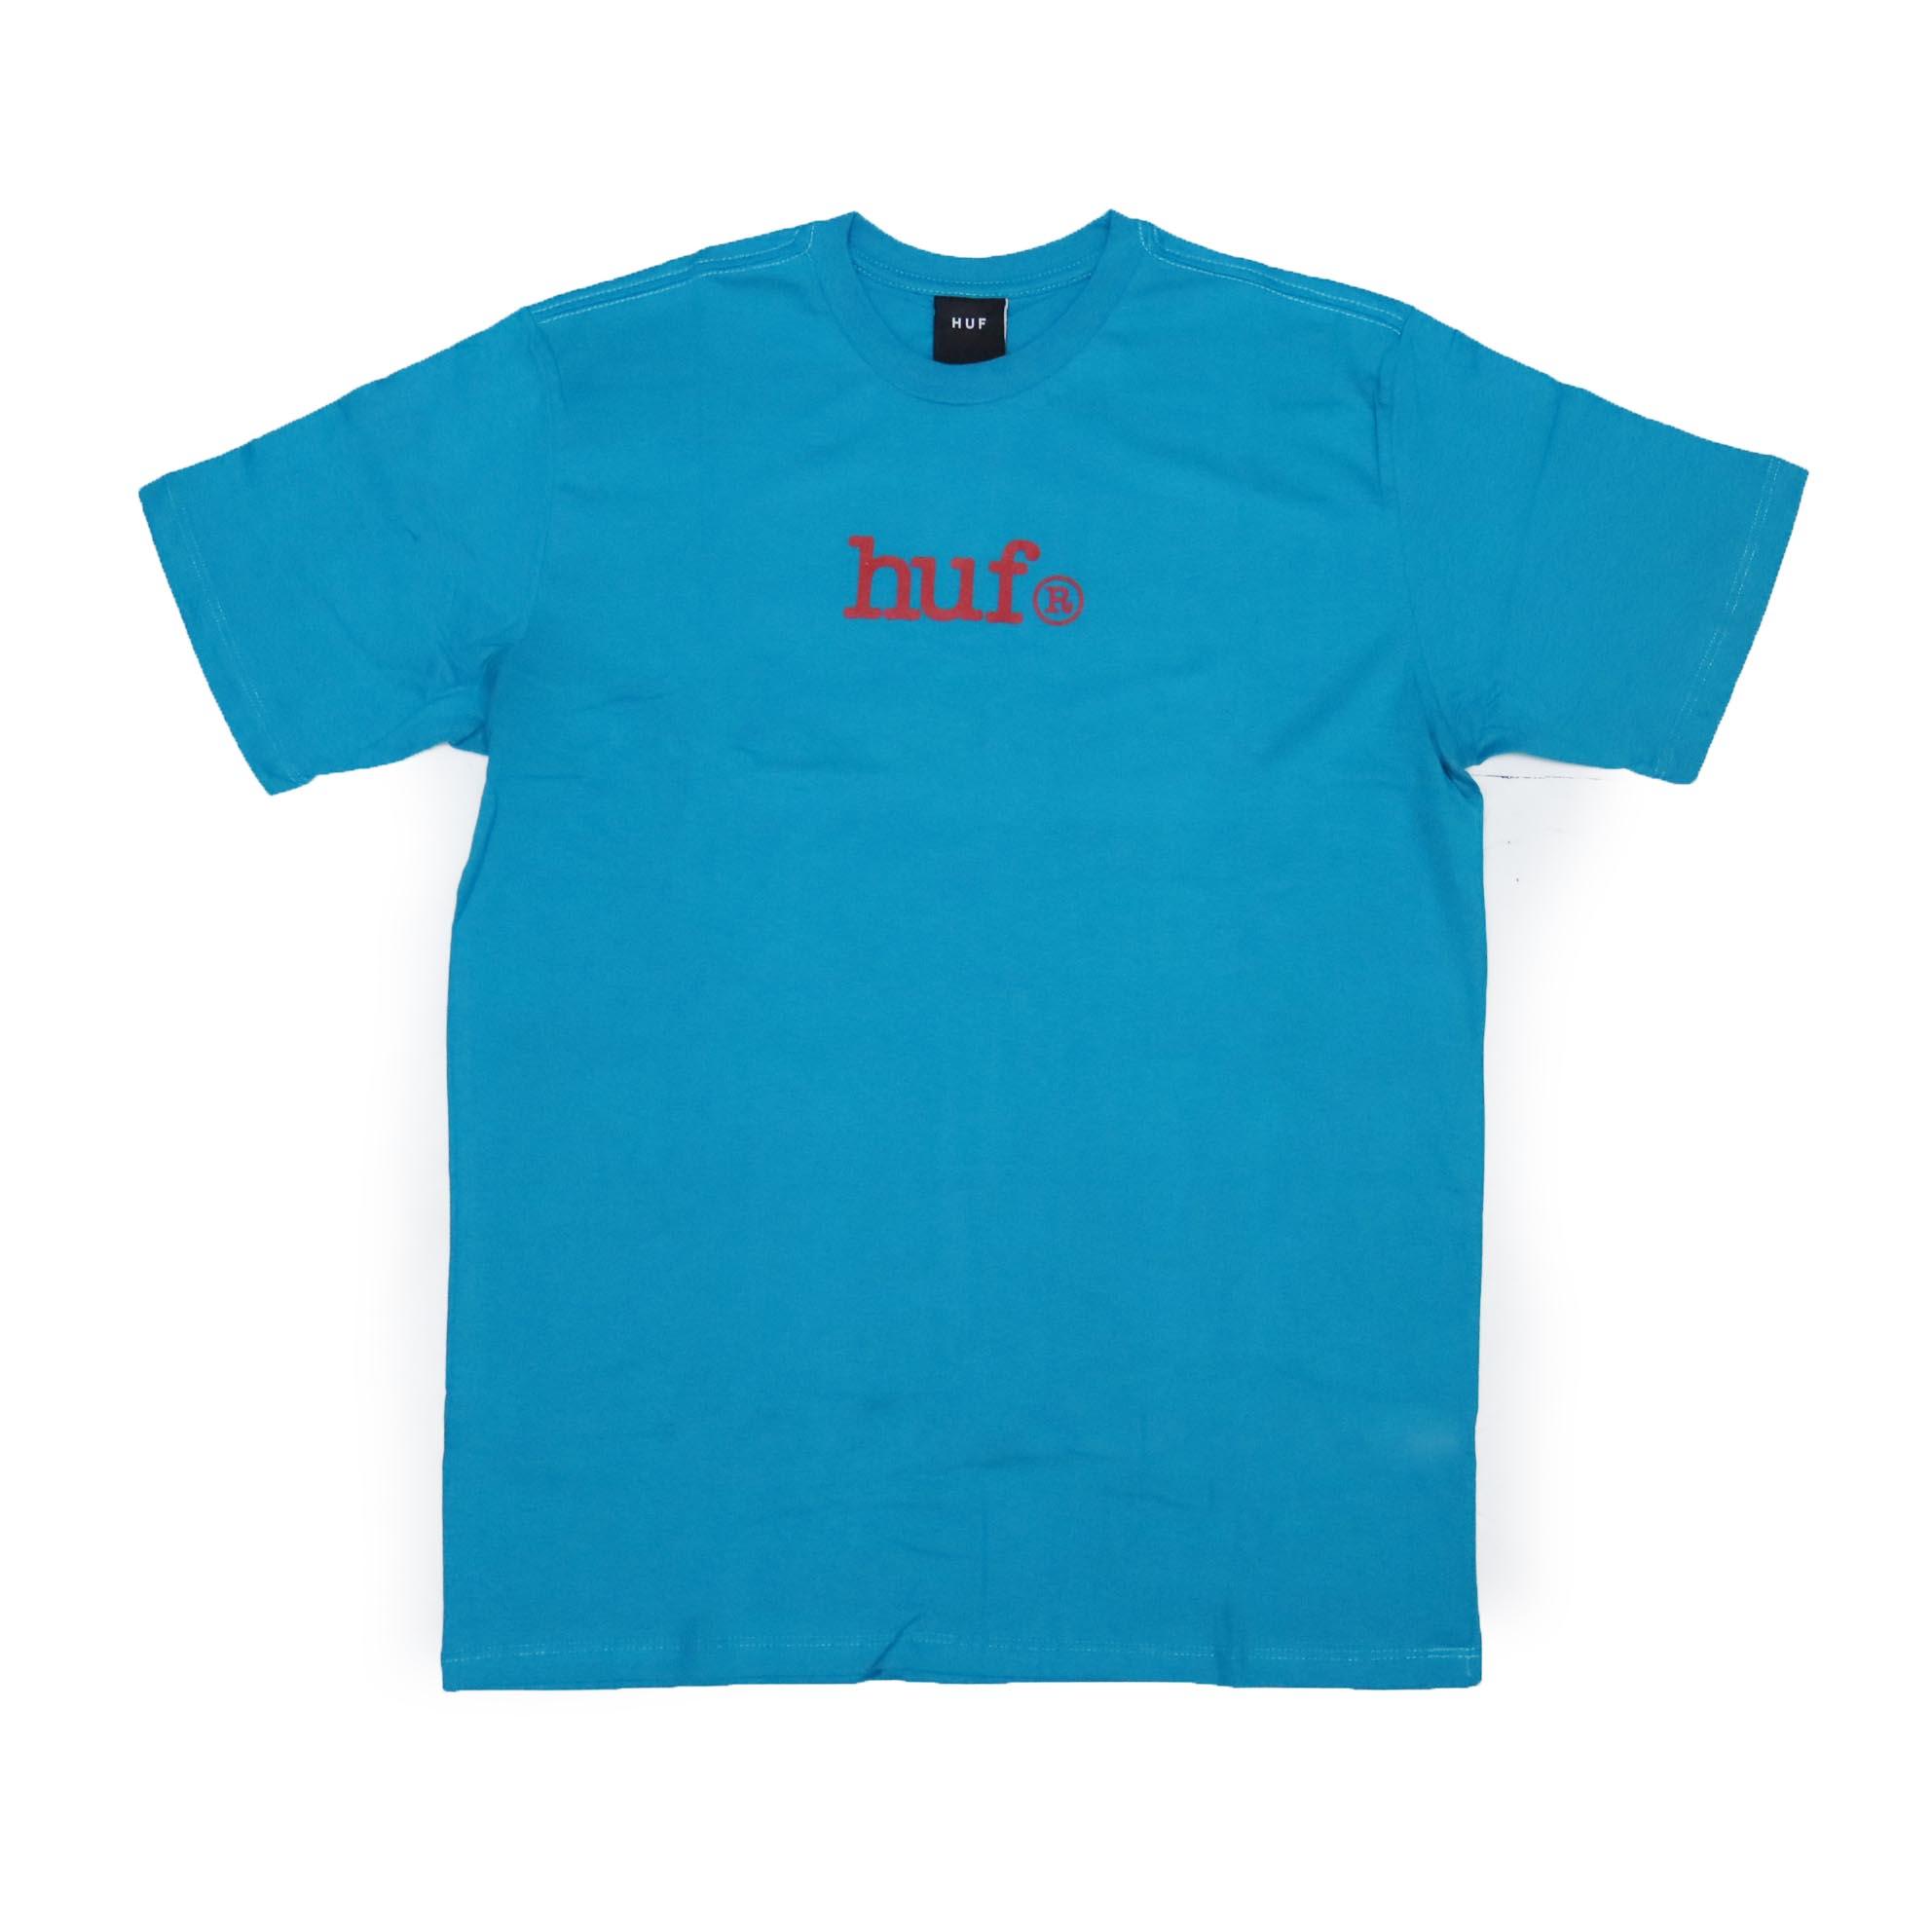 Camiseta HUF Type - Azul Turqueza